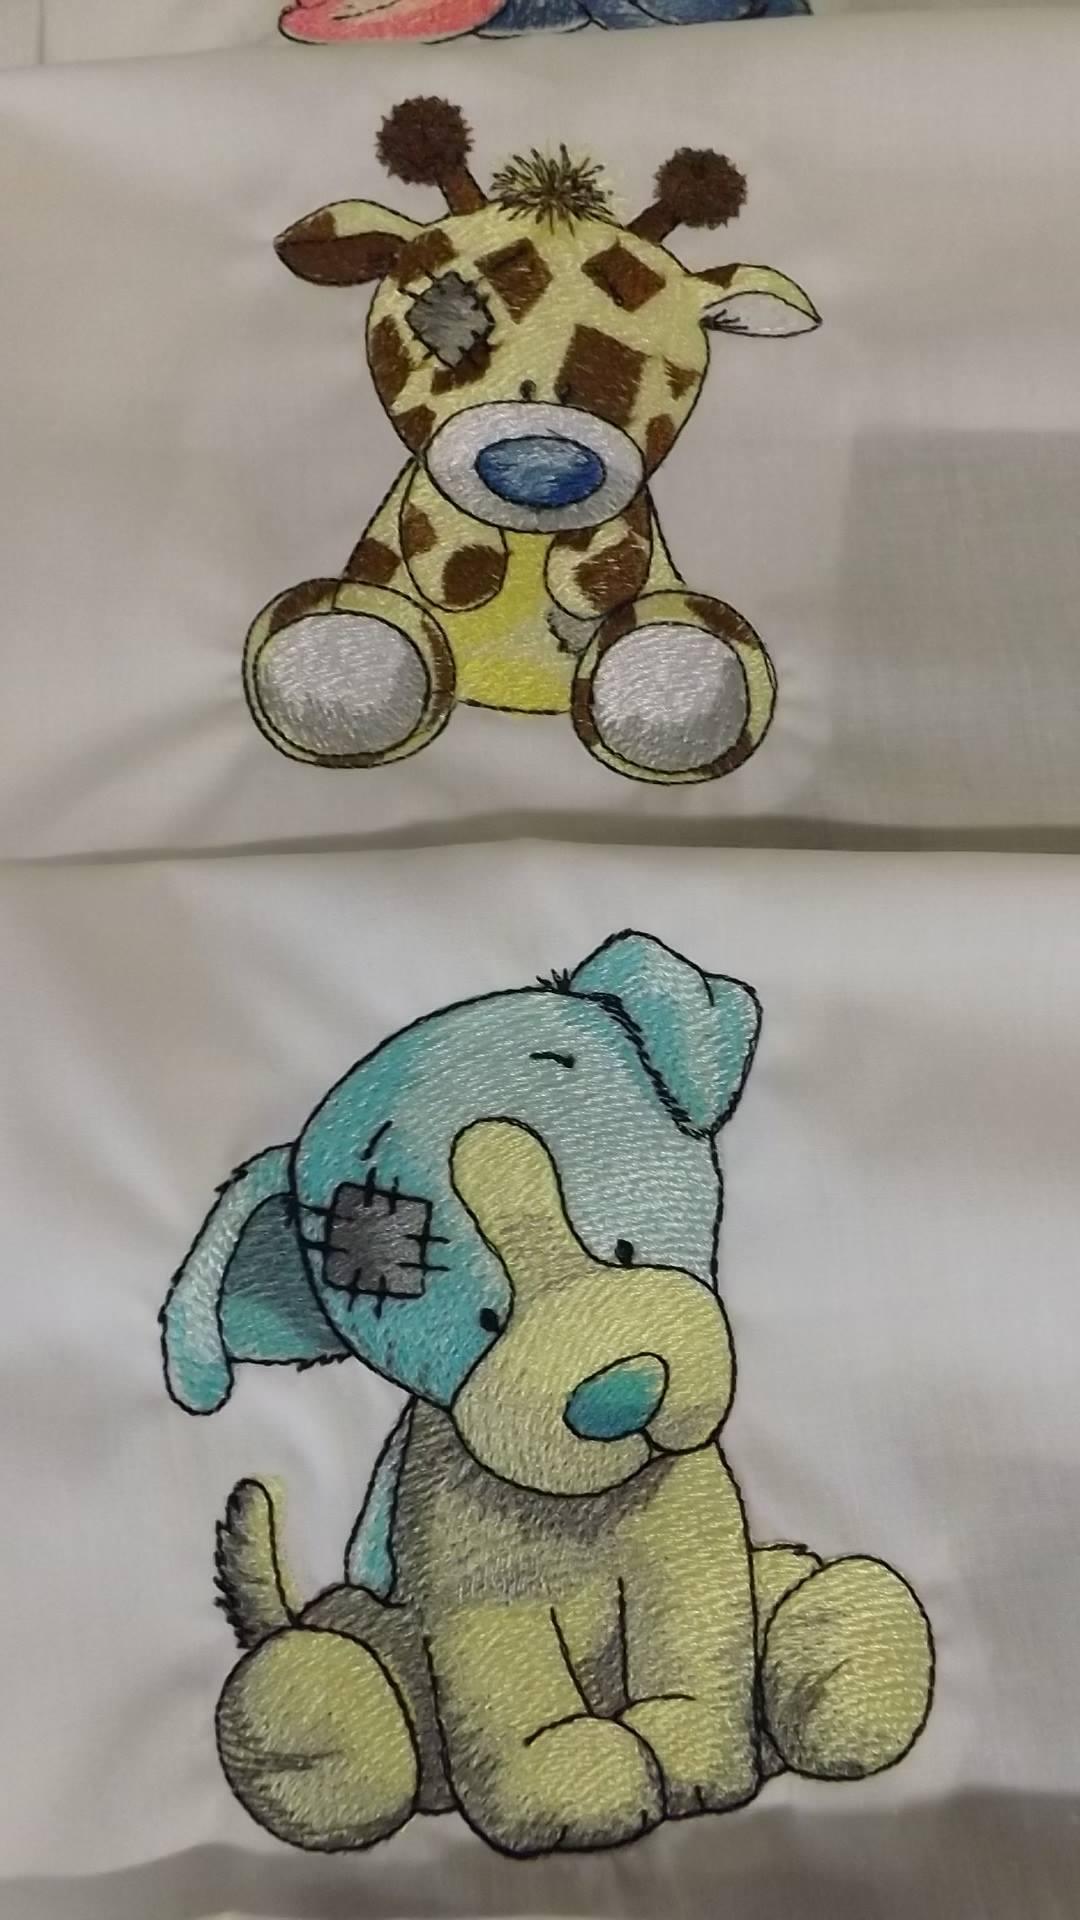 Twiggy Giraffe and Chase dog embroidery design